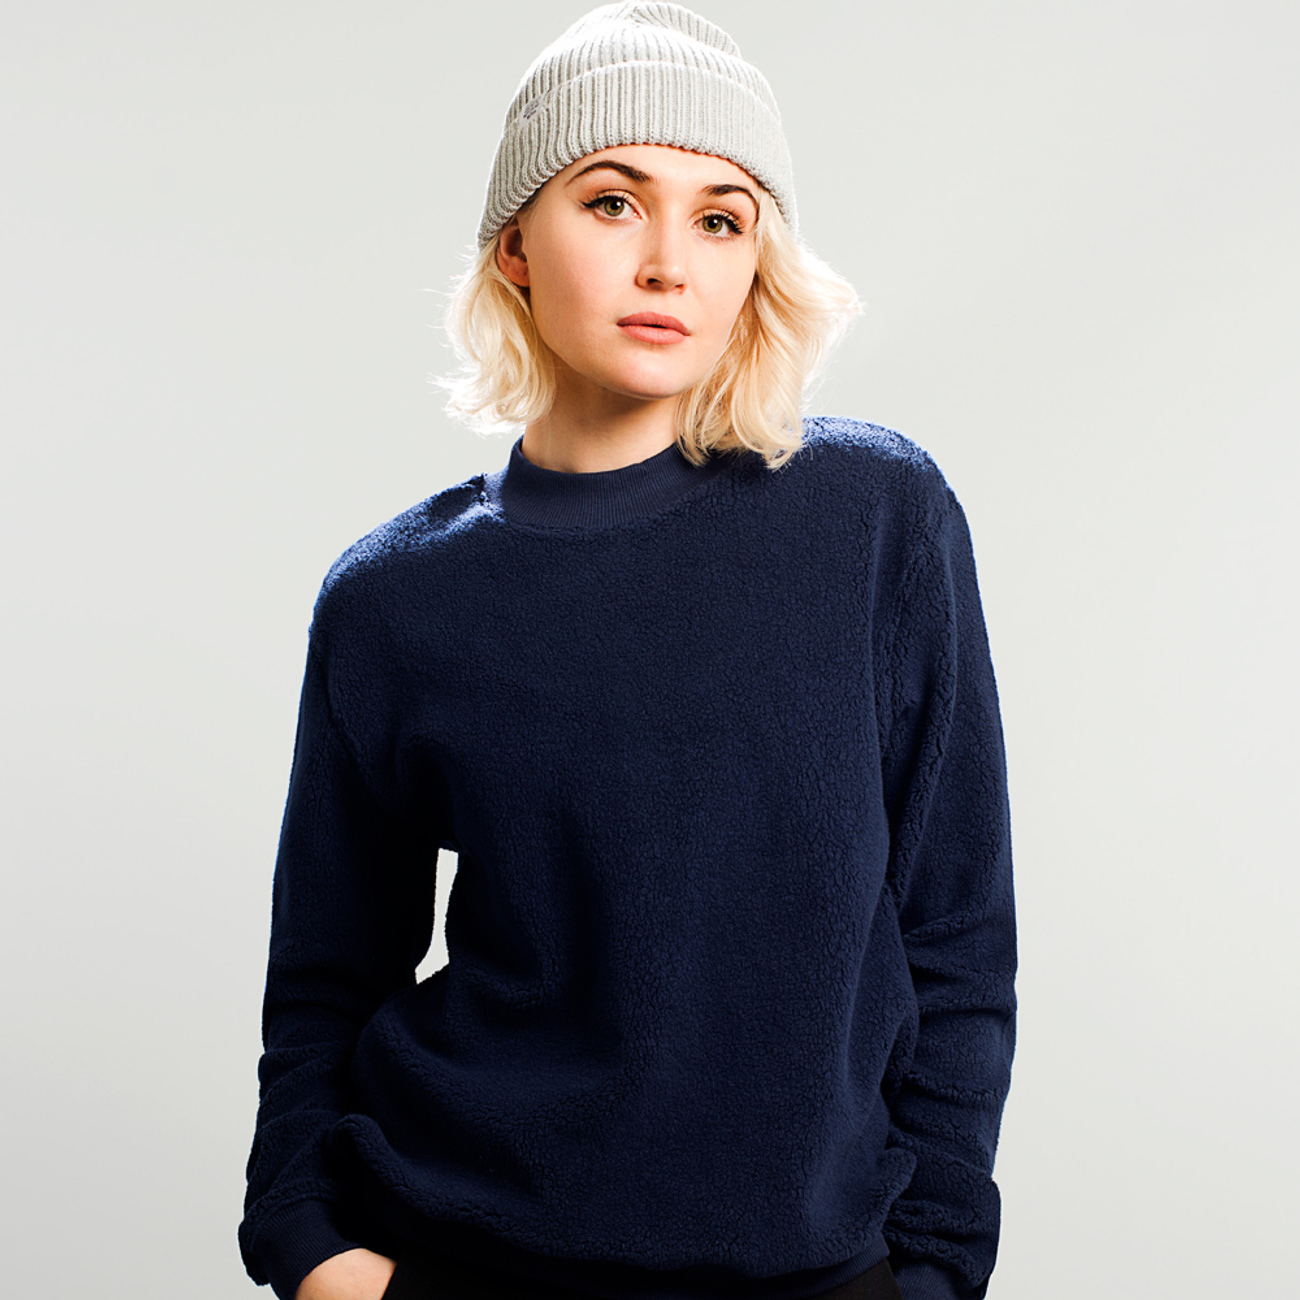 Sweatshirt Viborg Plush